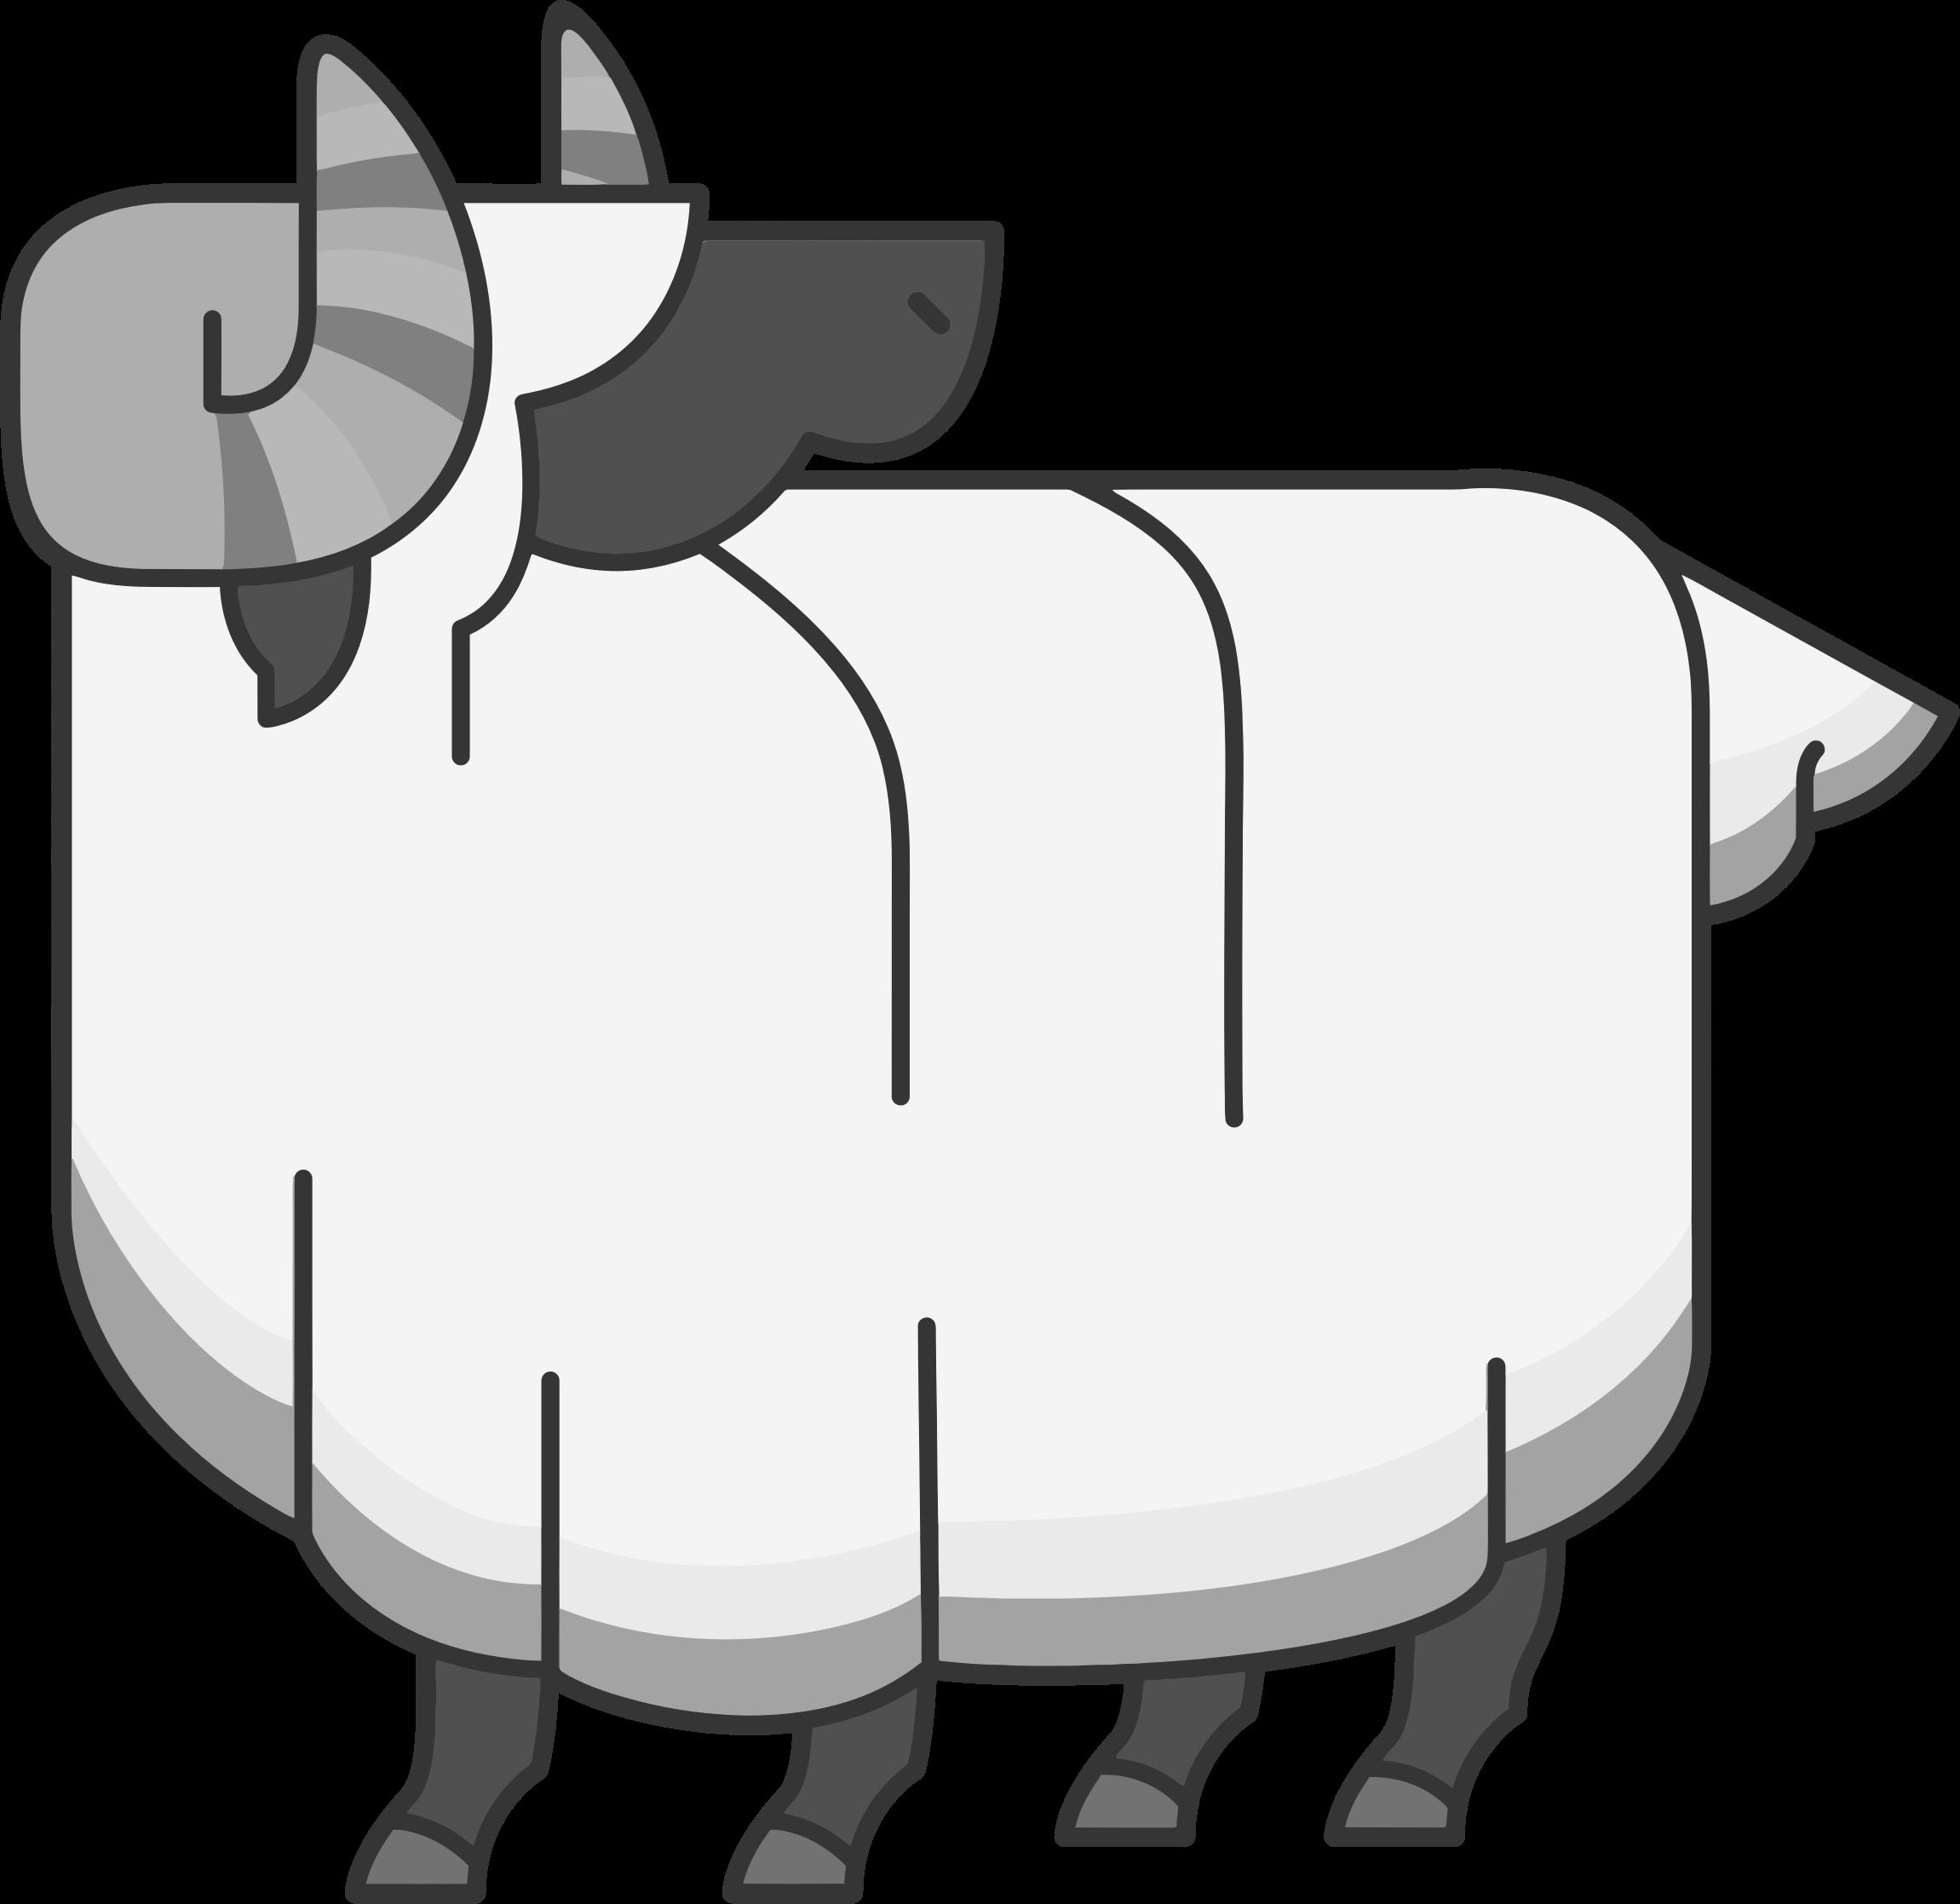 jpg black and white stock Ram clipart black and white. Clipartblack com animal free